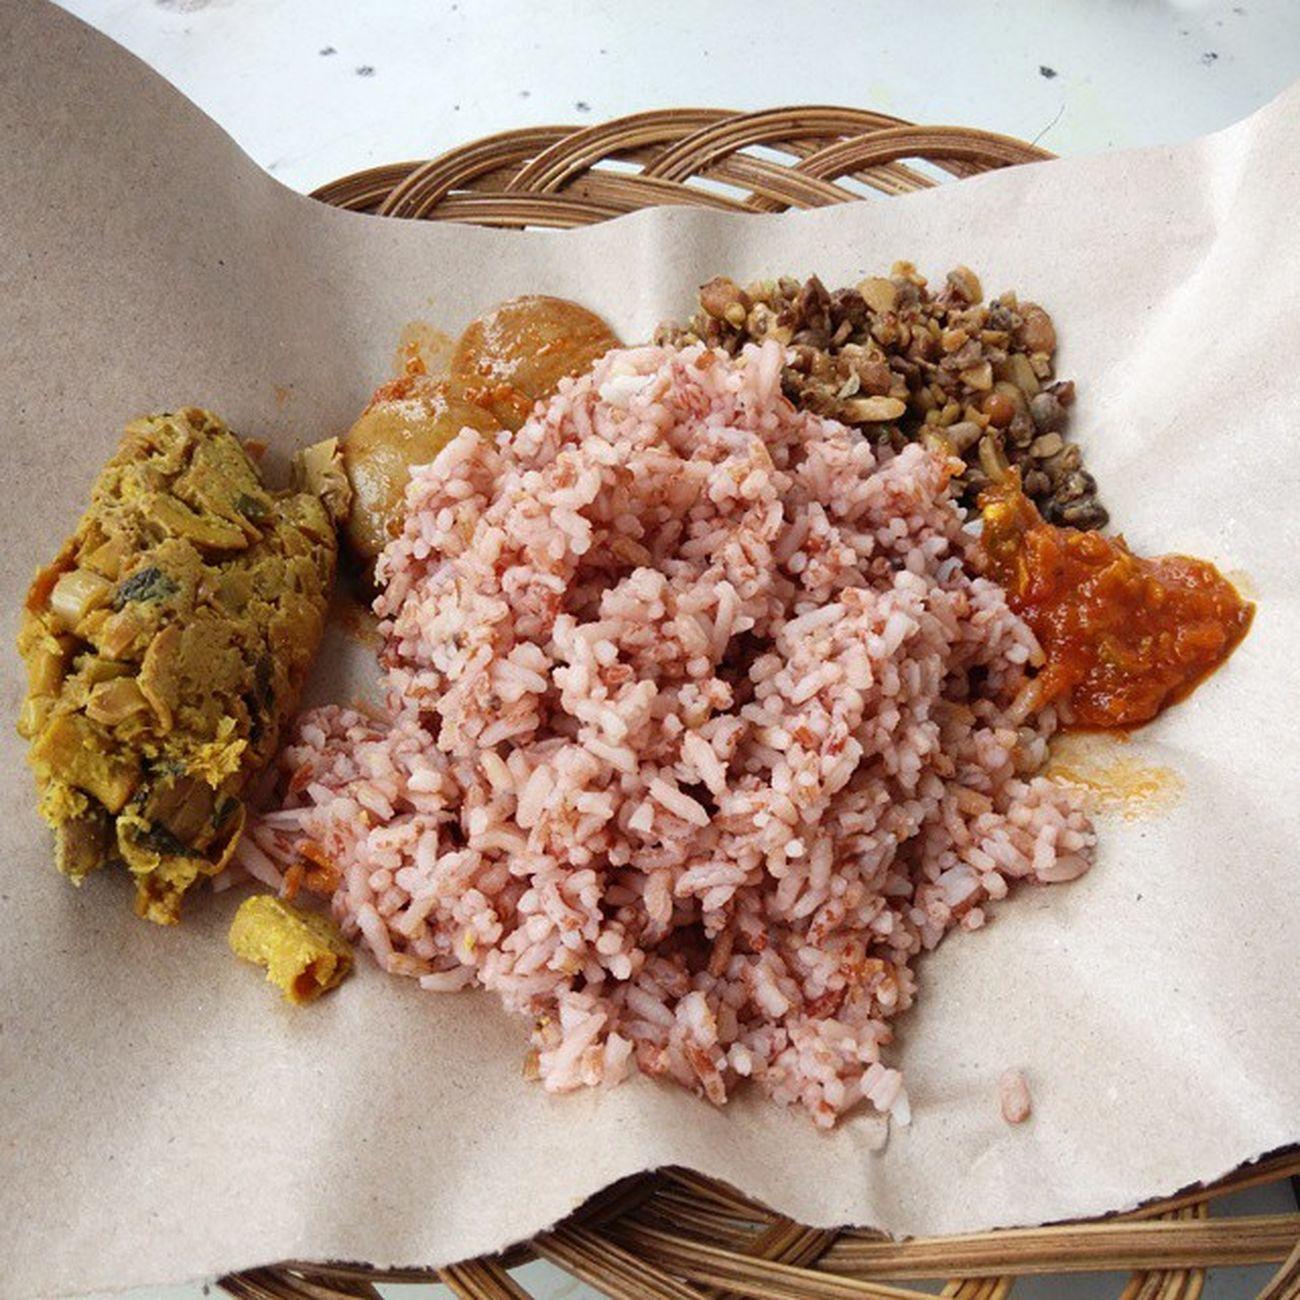 Sarapan nasi merah dulu WilujengEnjing Kuningan Jawabarat Gadgetlicious